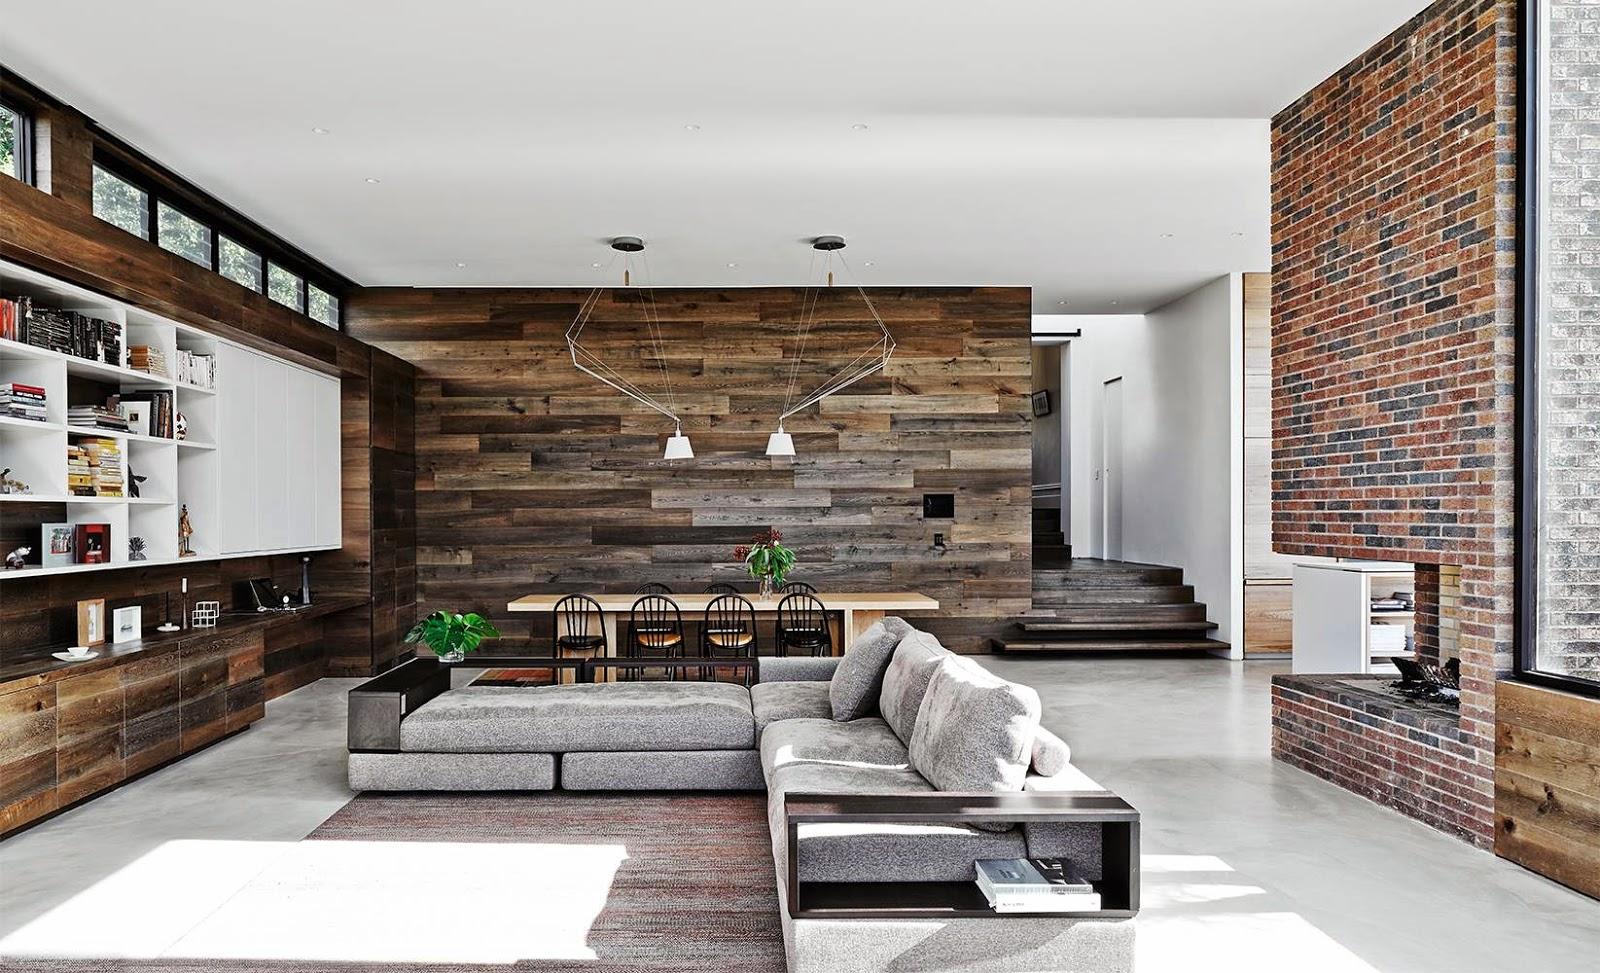 Blending Kitchen And Living Room